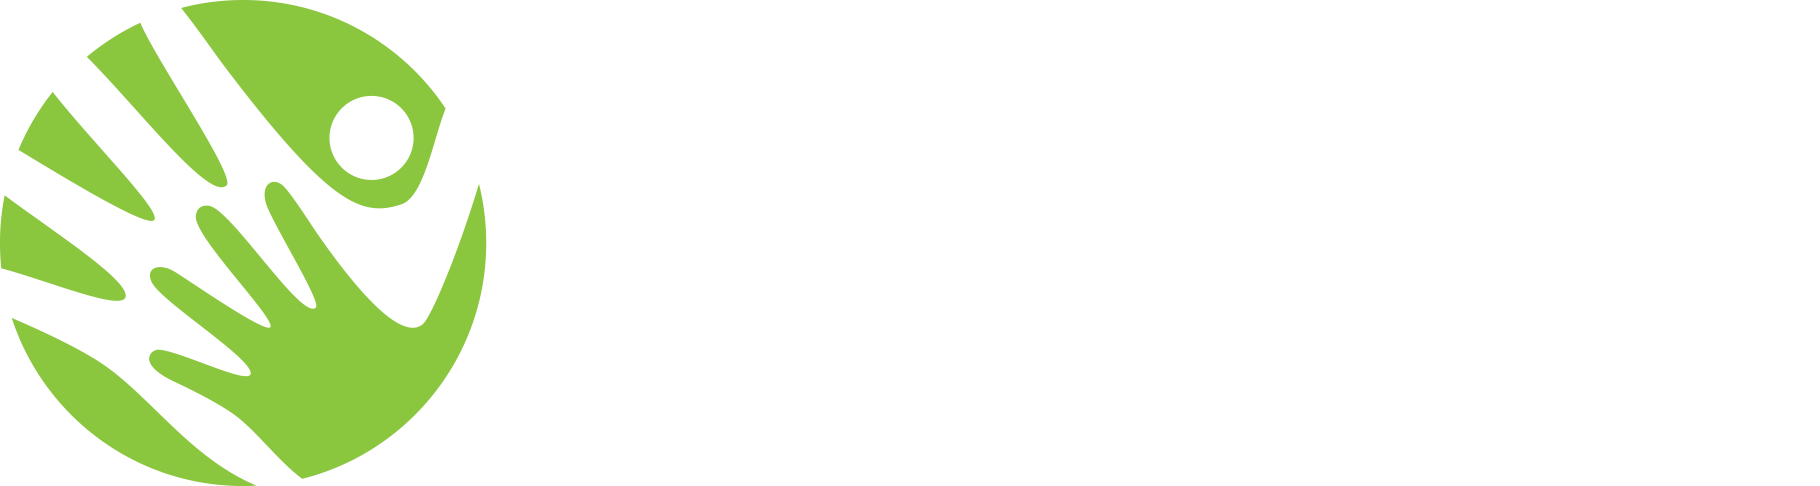 tuisku_vaaka_nega